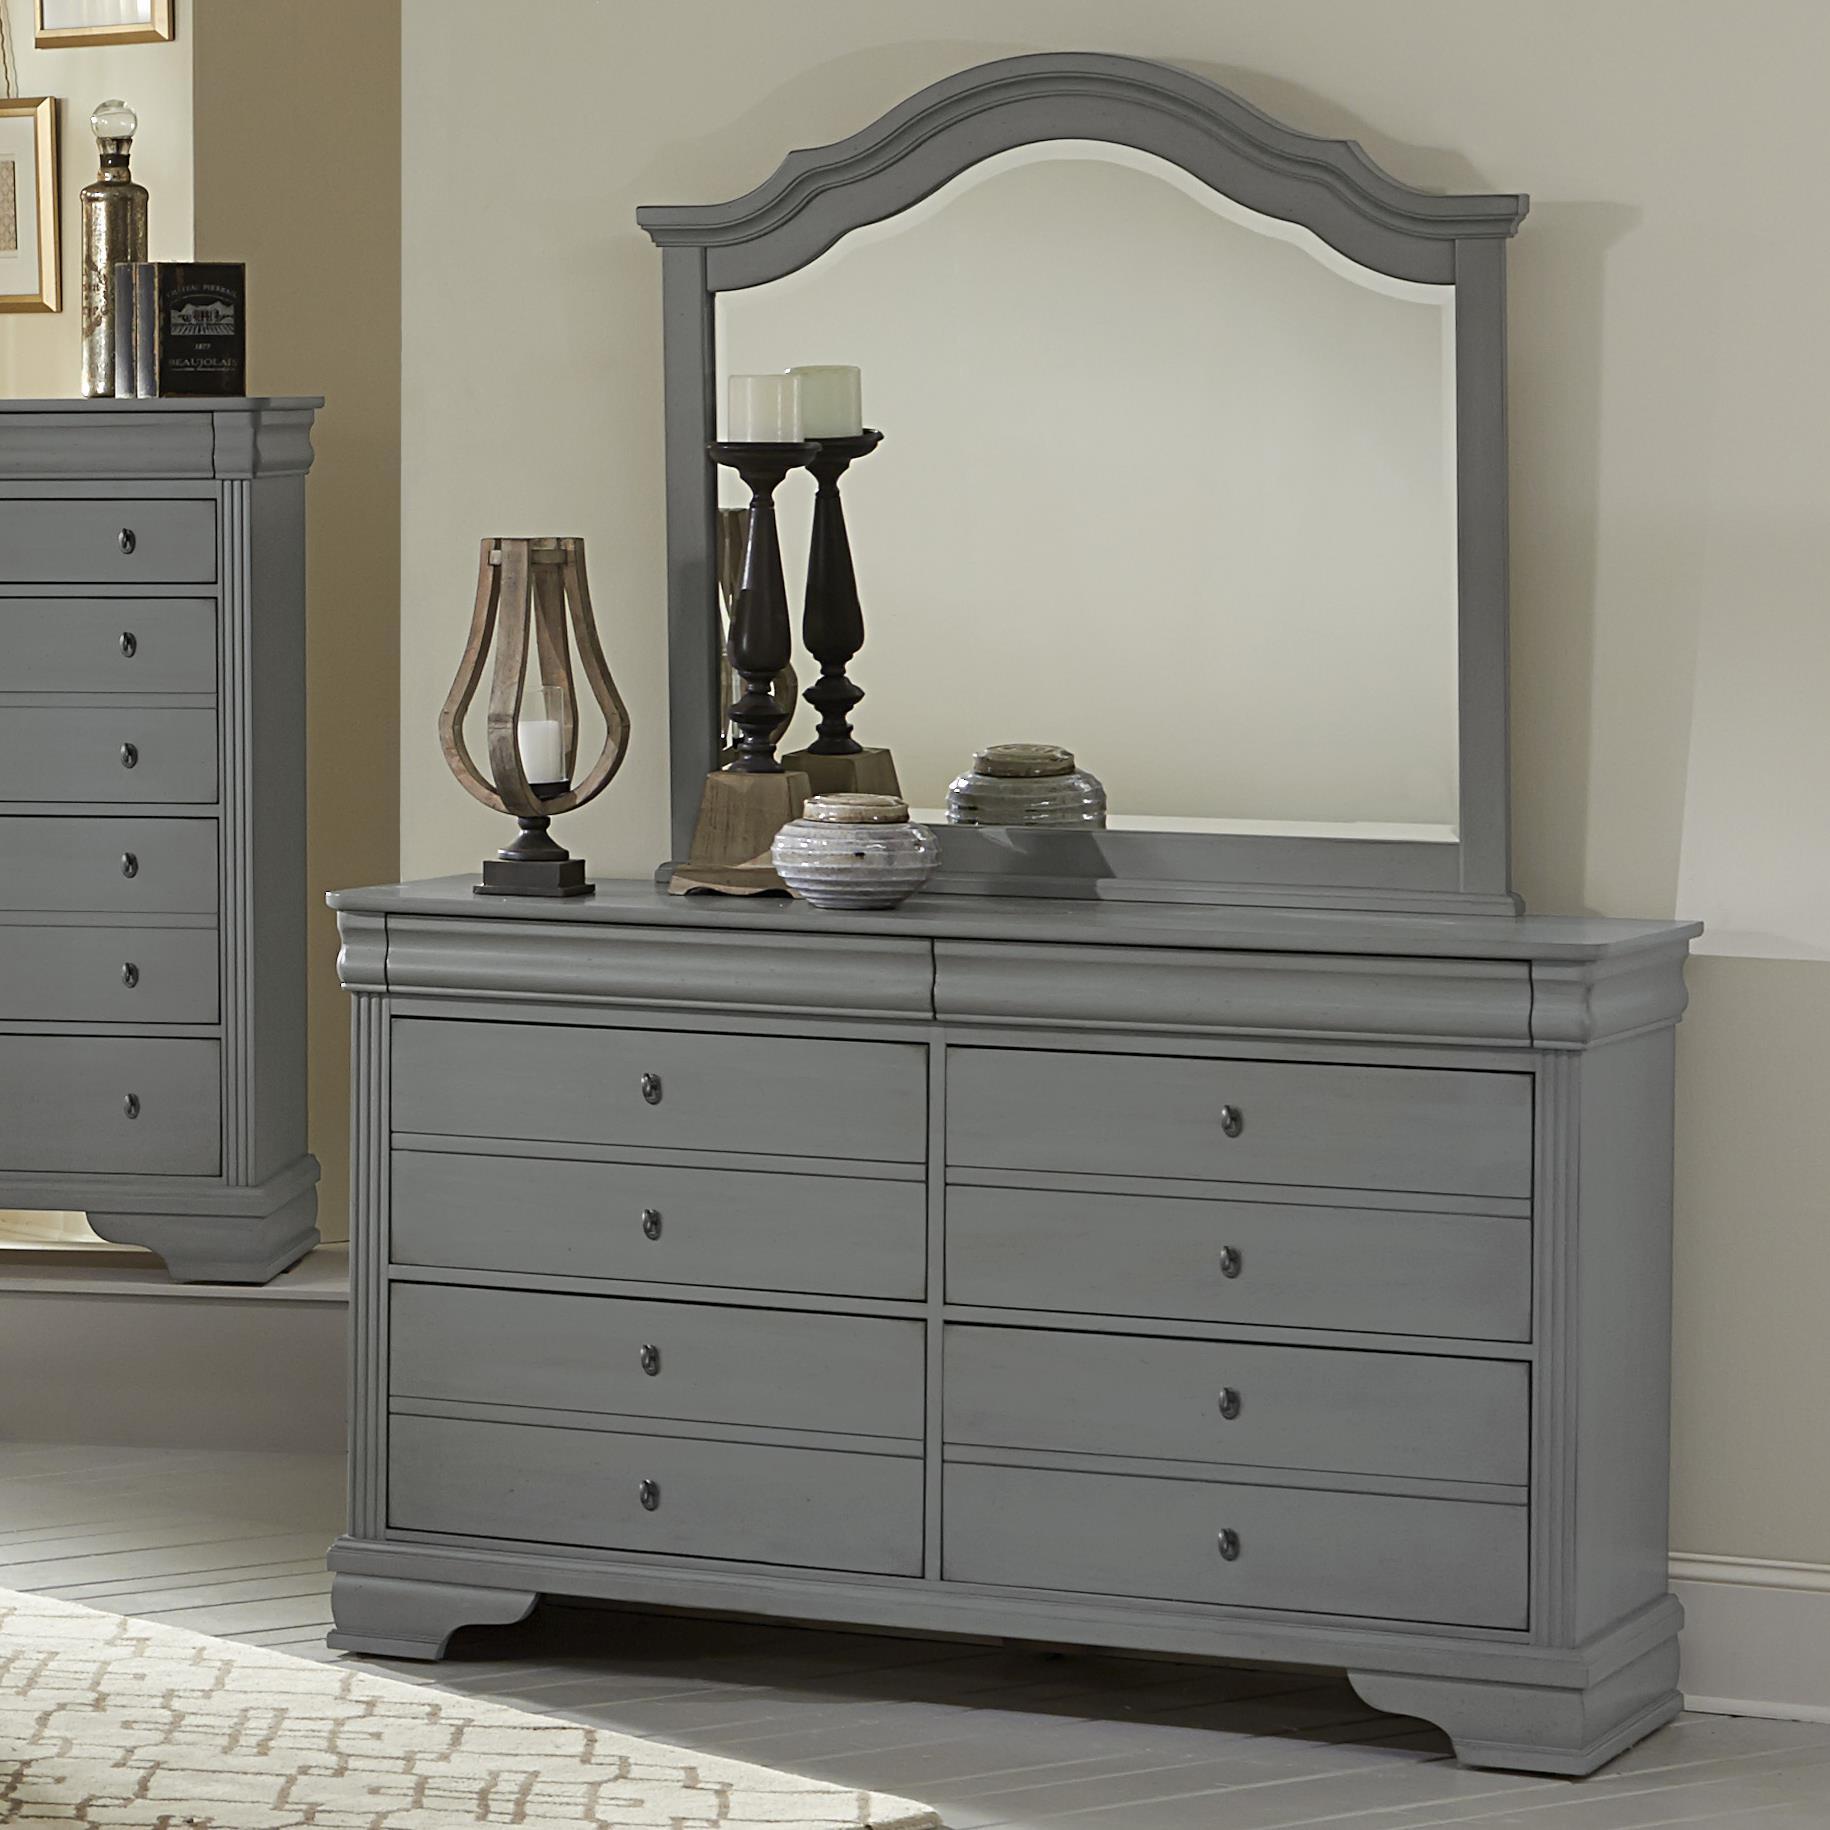 Vaughan Bassett French Market Dresser & Arched Mirror - Item Number: 381-002+447